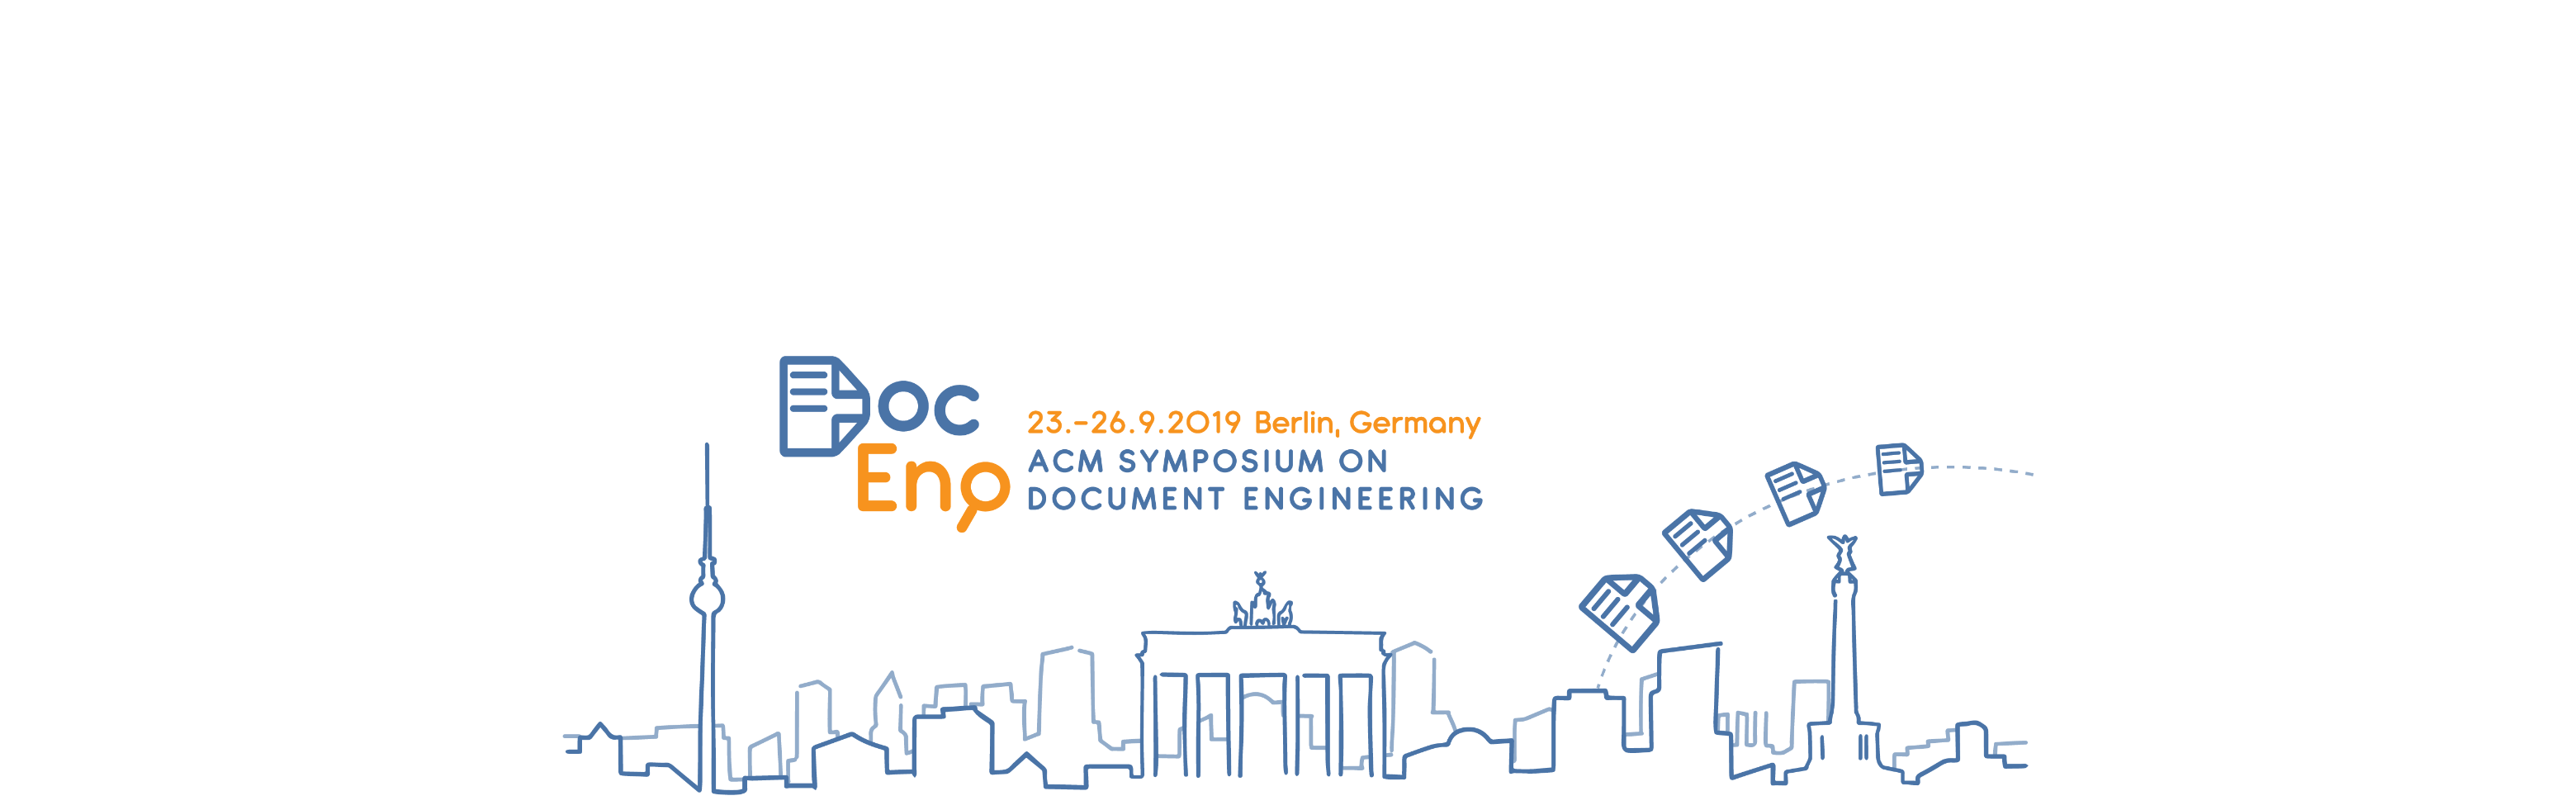 DPS, Veranstaltungshinweis, ACM DocEng 2019, Header, 03.07.2019